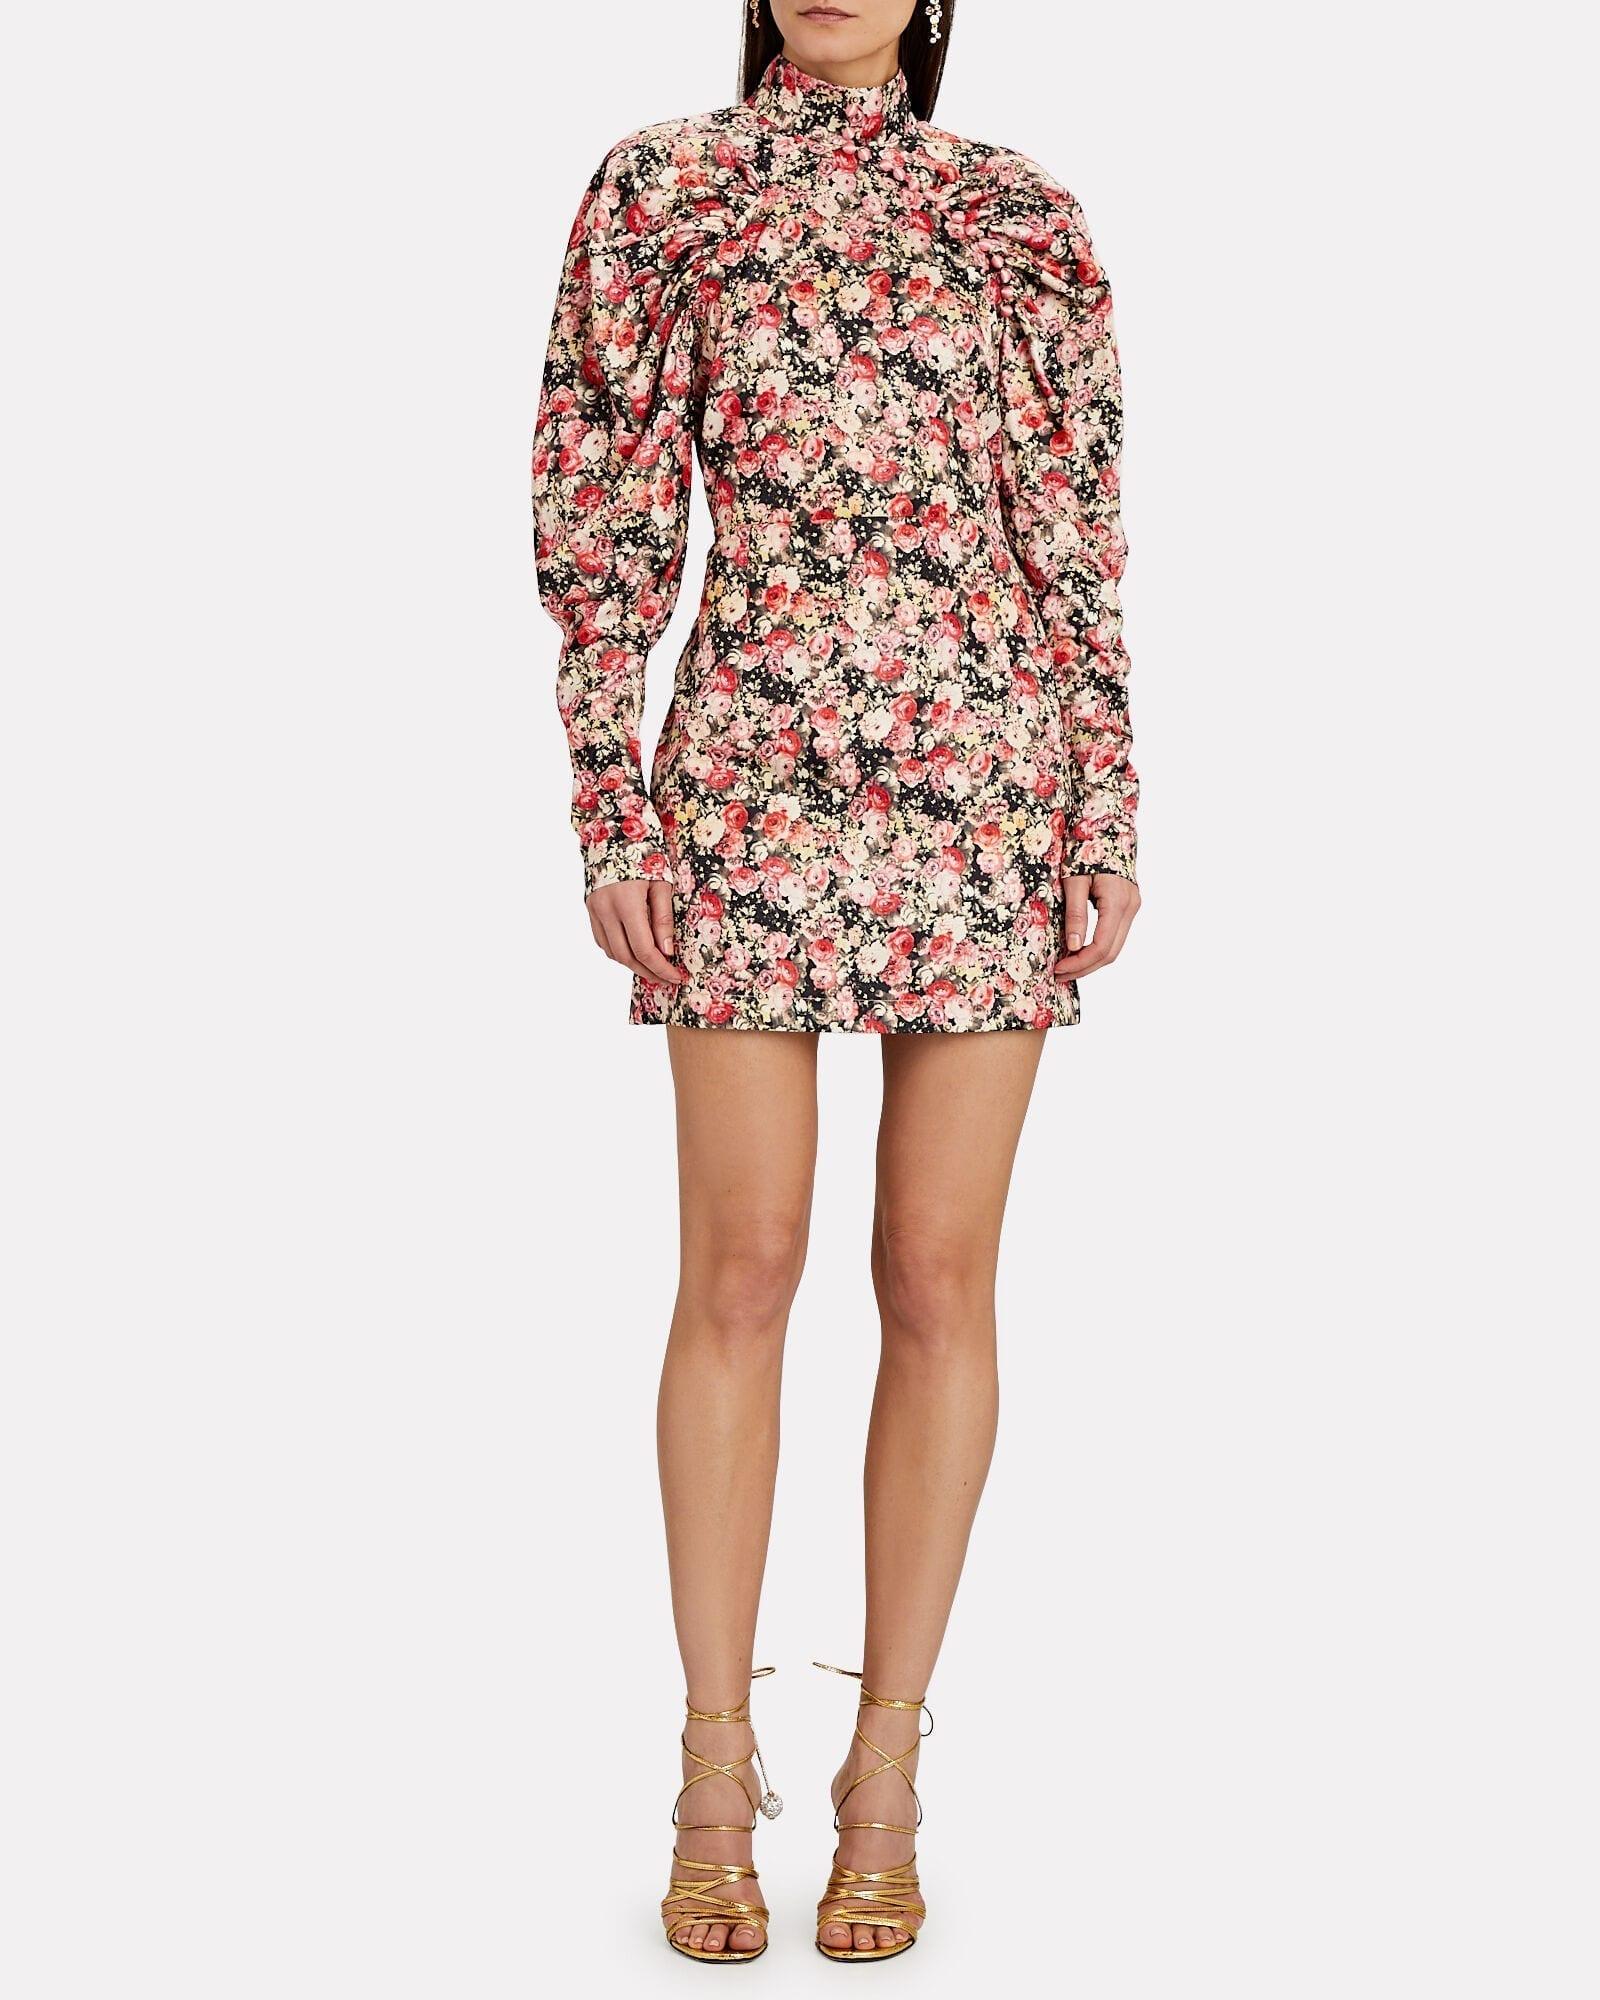 ROTATE BIRGER CHRISTENSEN Kim Ruched Floral Mini Dress